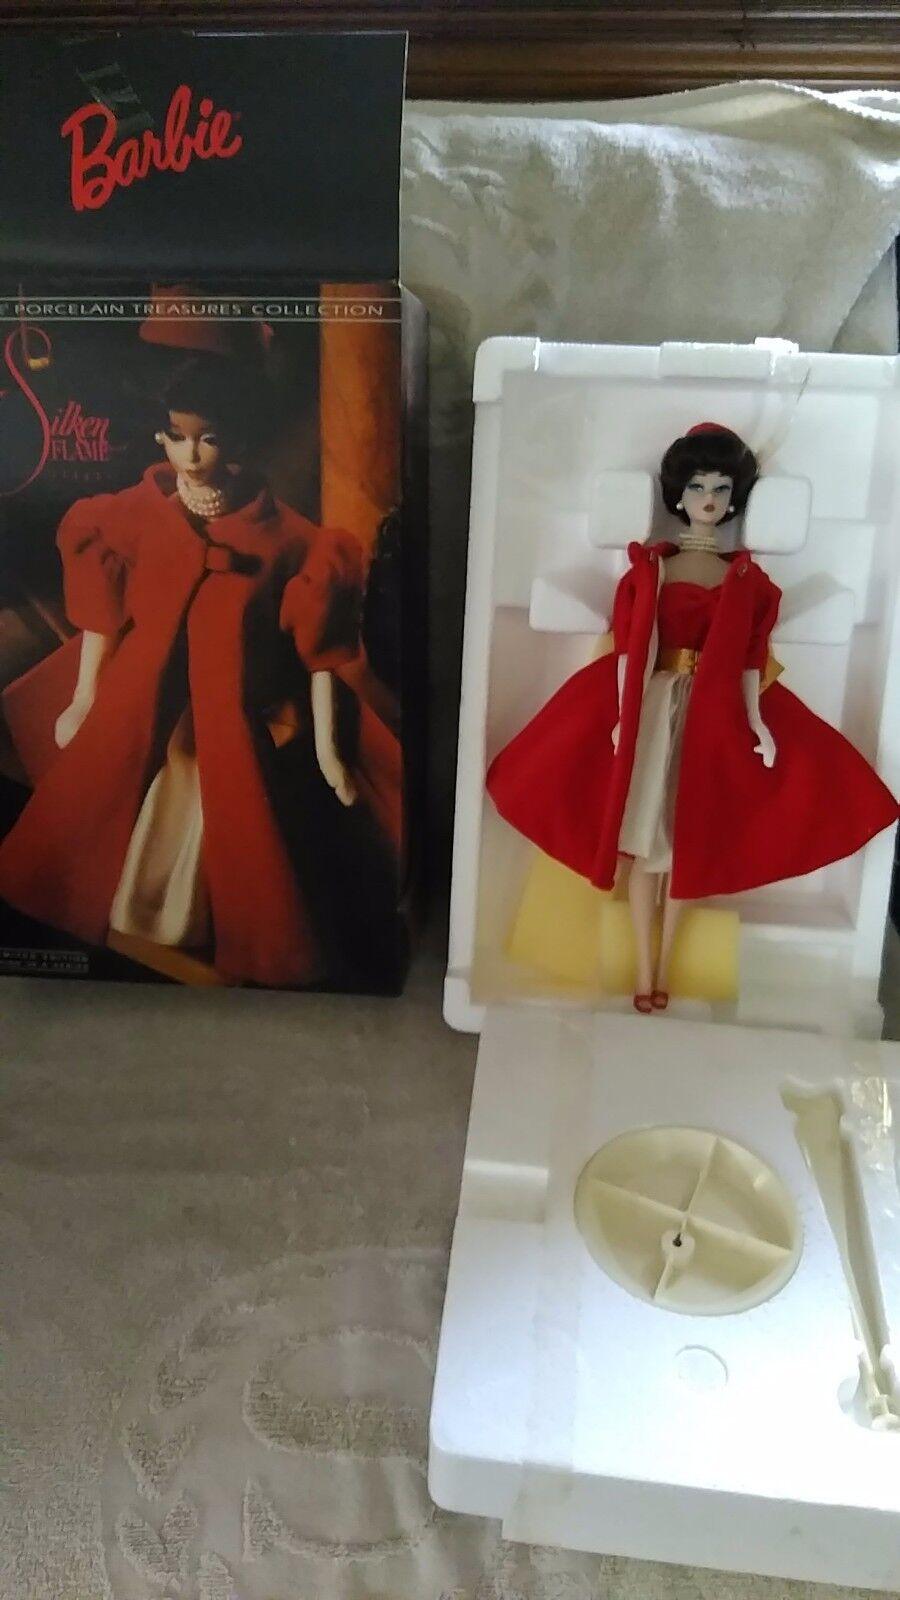 1992 Muñeca Barbie SILKEN FLAME tesoros de porcelana muñeca Barbie con Caja Original